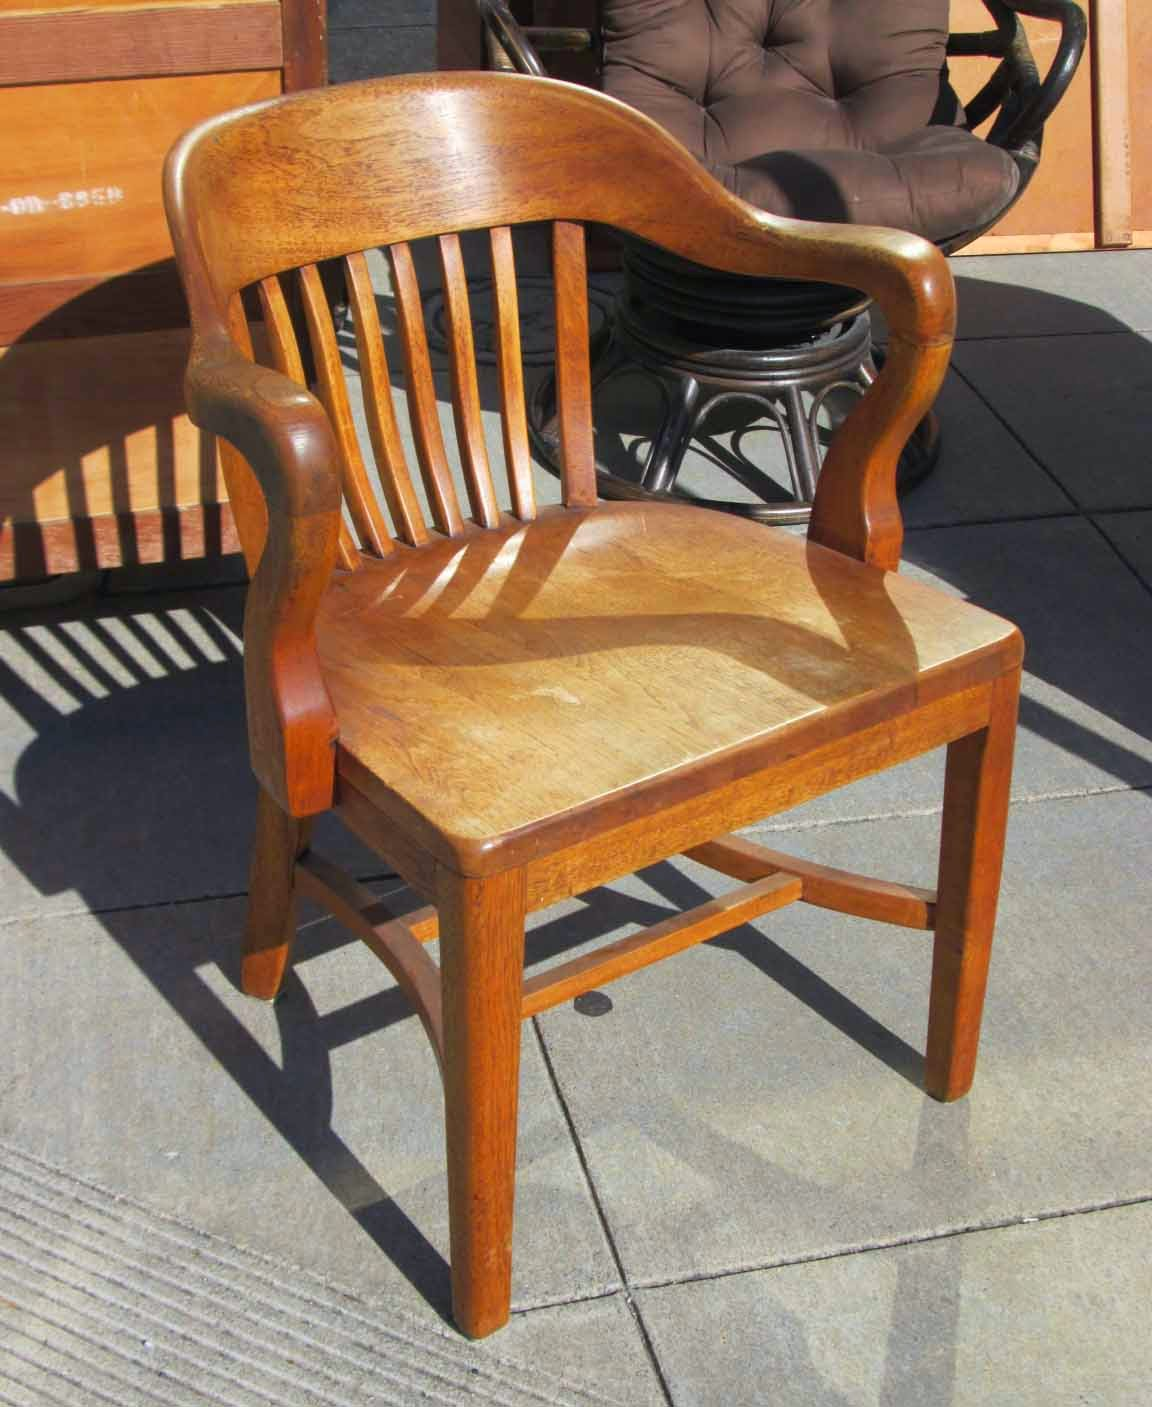 SOLD Antique Oak Bankeru0027s Chair   $60